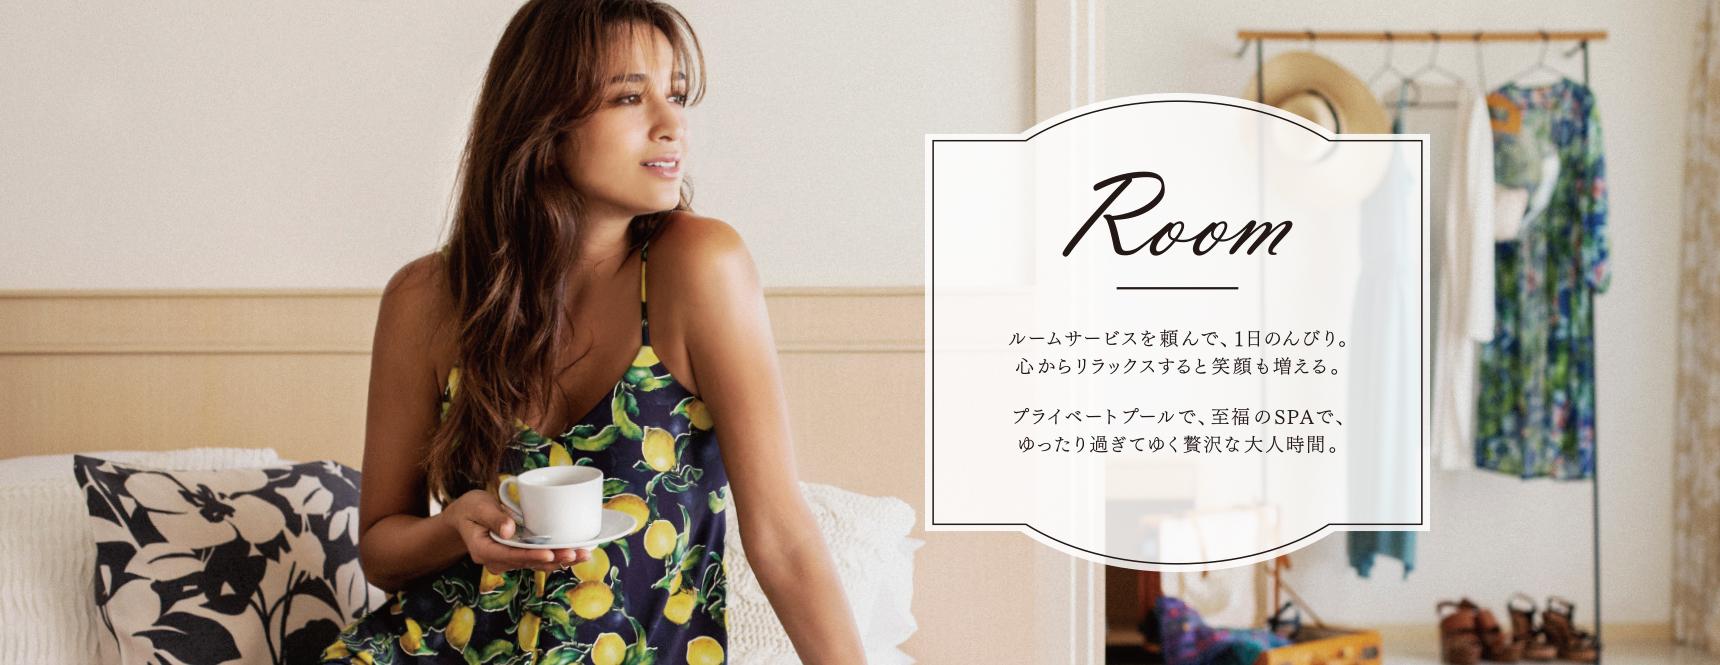 San-ai Resort|Room